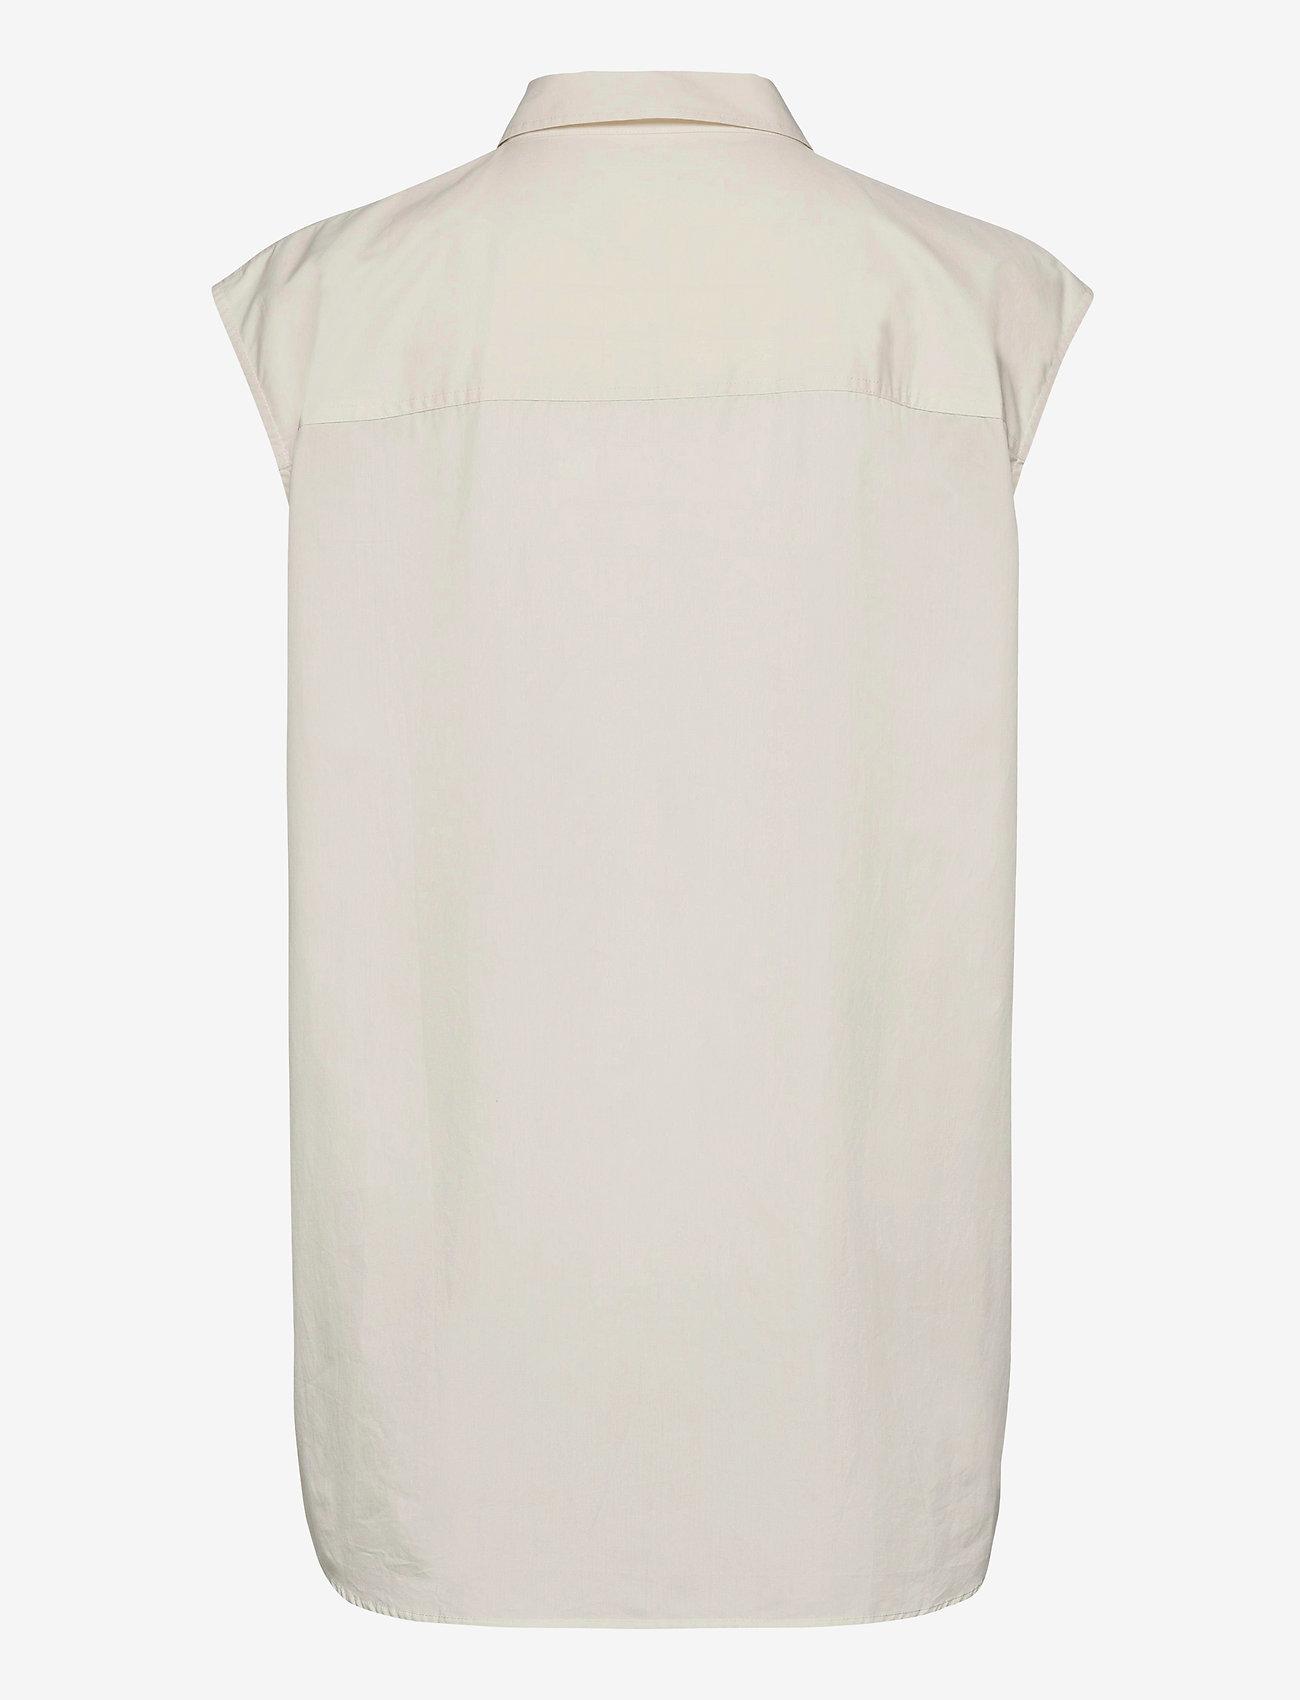 Samsøe Samsøe - Tea shirt top 11466 - denim shirts - antique white - 2